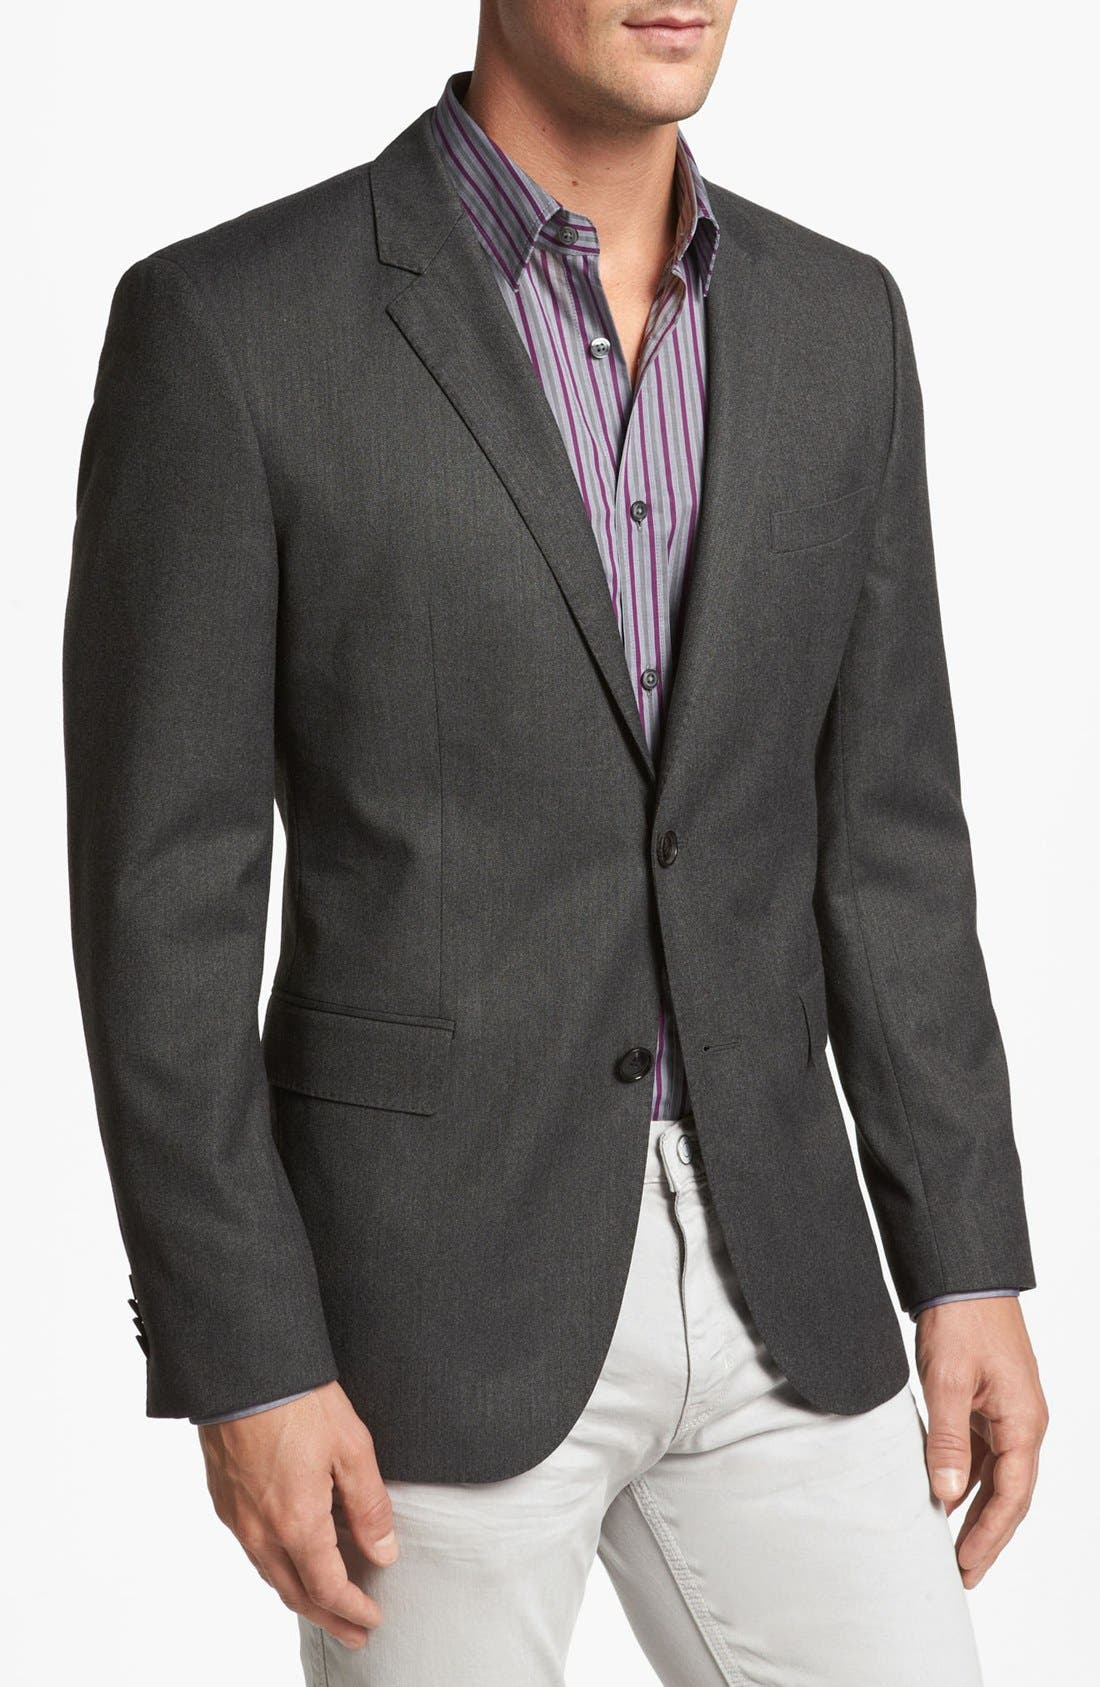 Main Image - BOSS HUGO BOSS 'Coastes' Trim Fit Sportcoat